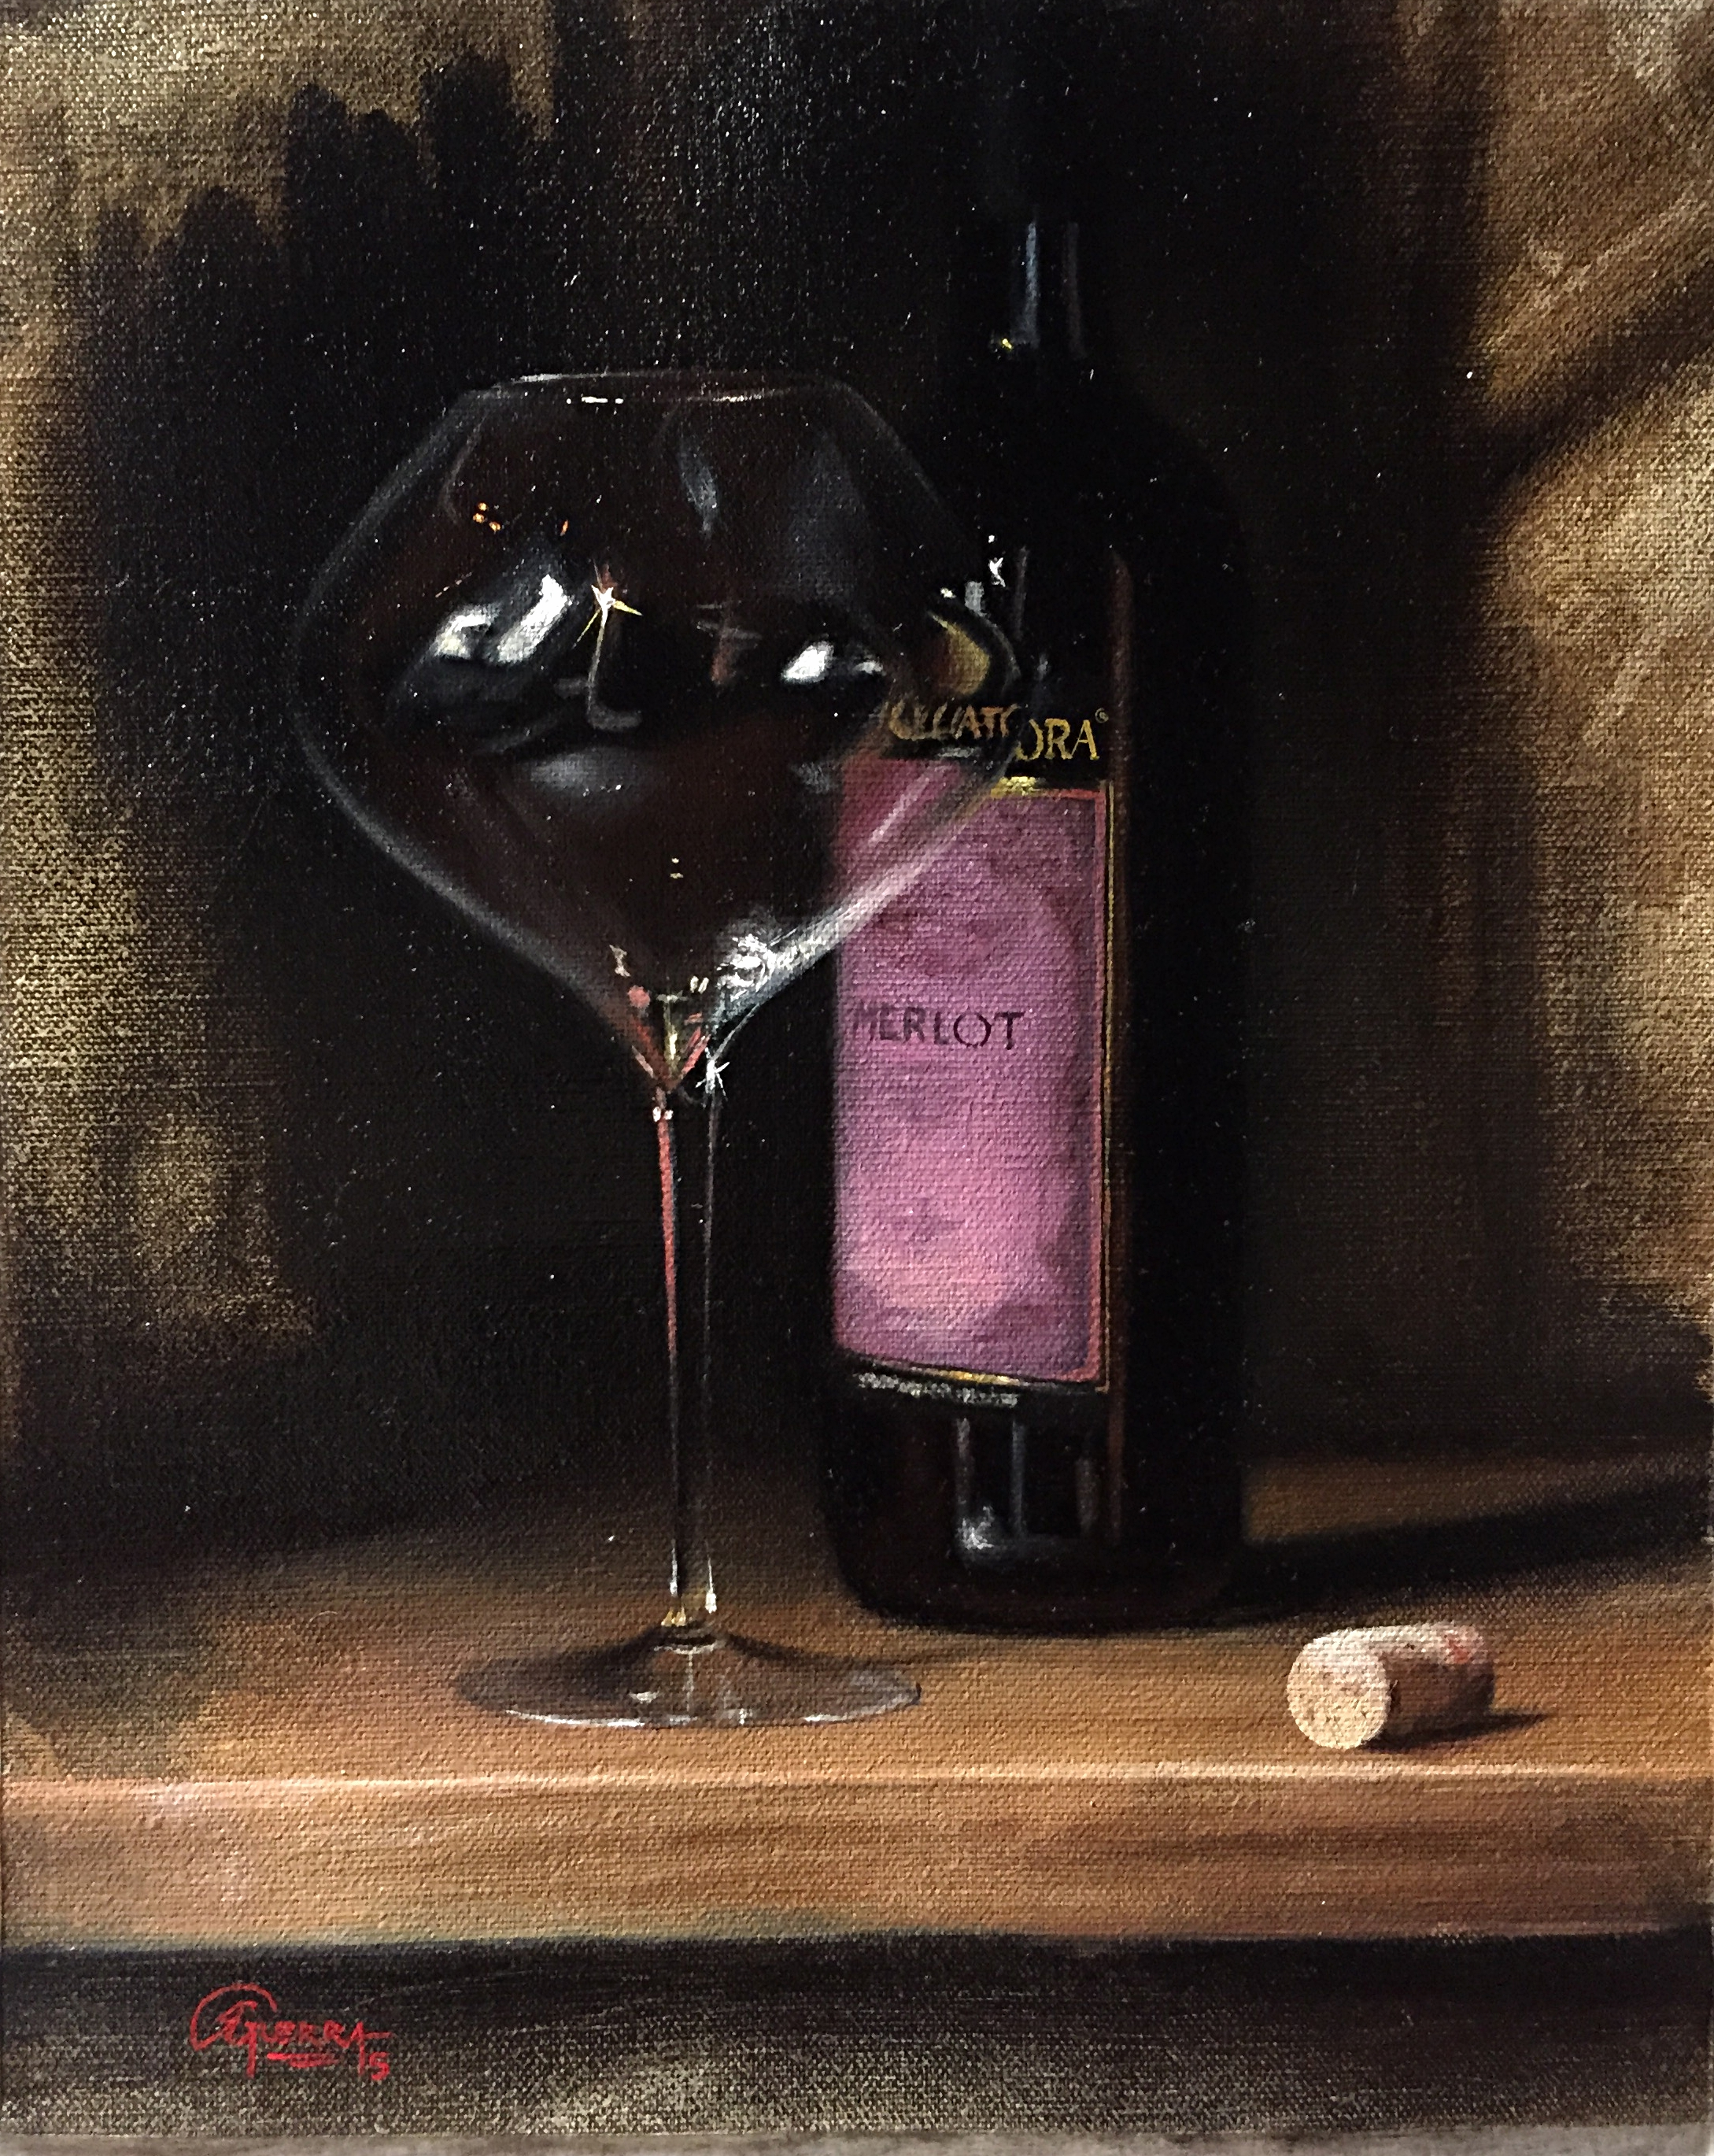 Wine Glass Study - Merlot, Rafael Guerra Painting Pintura